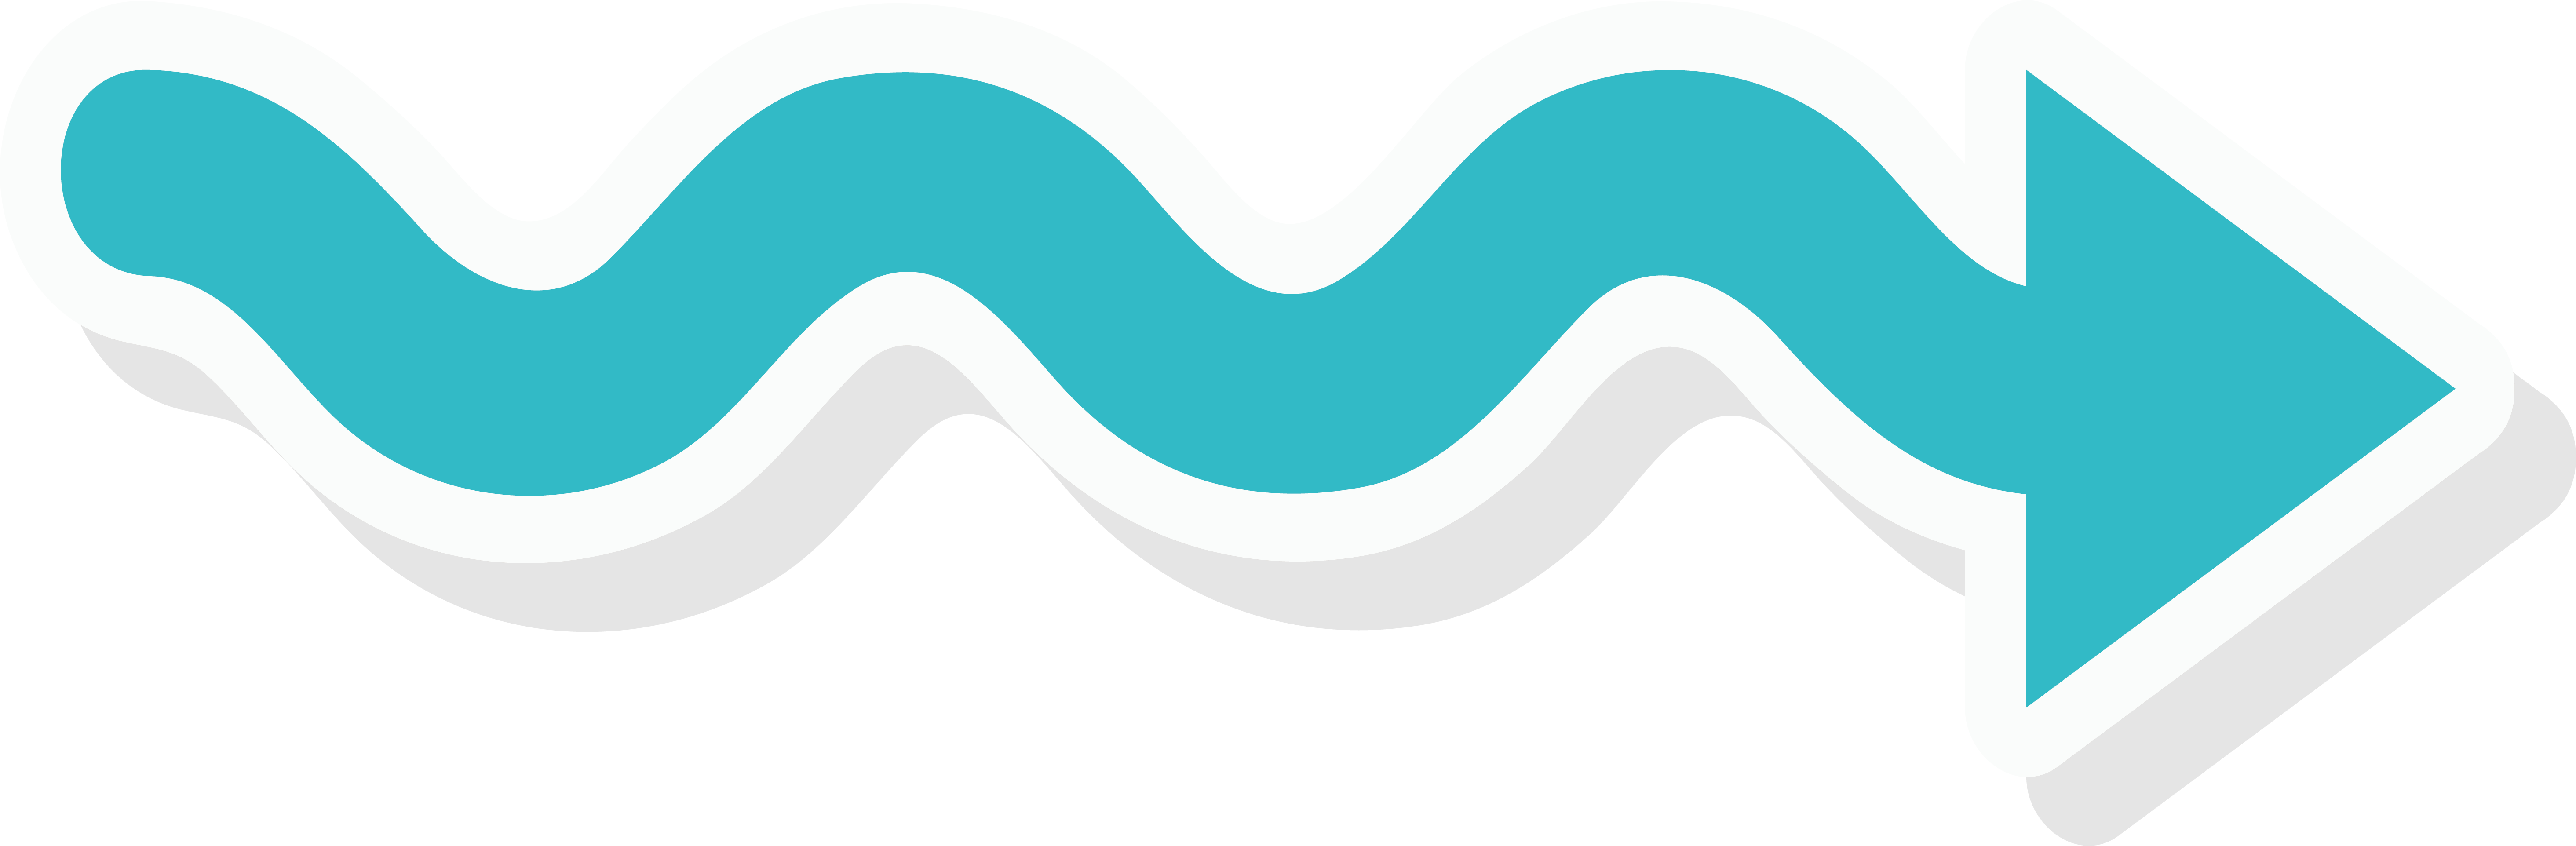 Wave arrow clipart jpg download Clipart arrows wave, Clipart arrows wave Transparent FREE ... jpg download